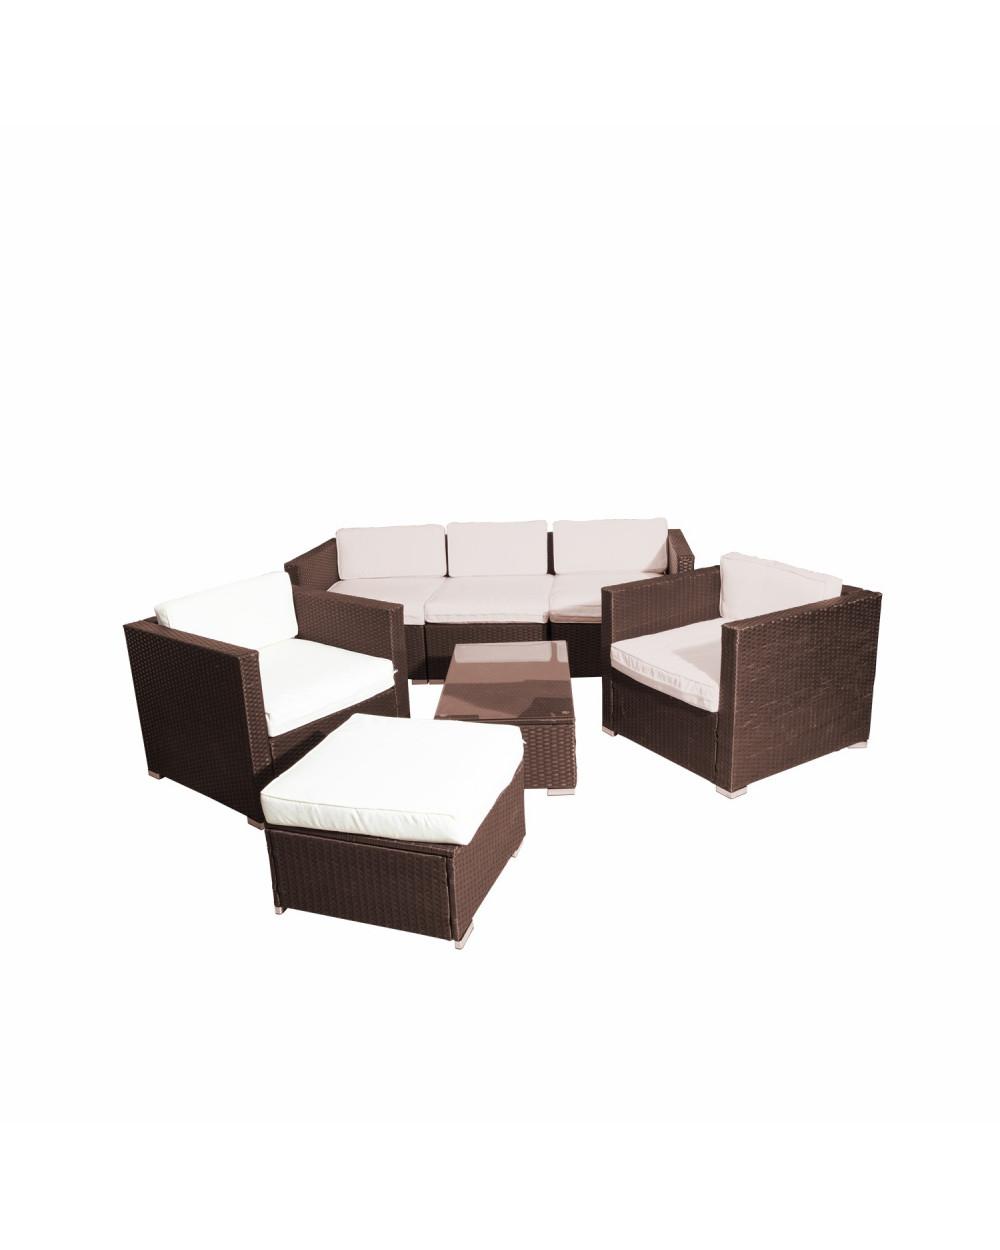 Familia Set Manhattan Sofa+2 Sillo+Ottoman+Mesa+Coji Rattan Black HIH-315